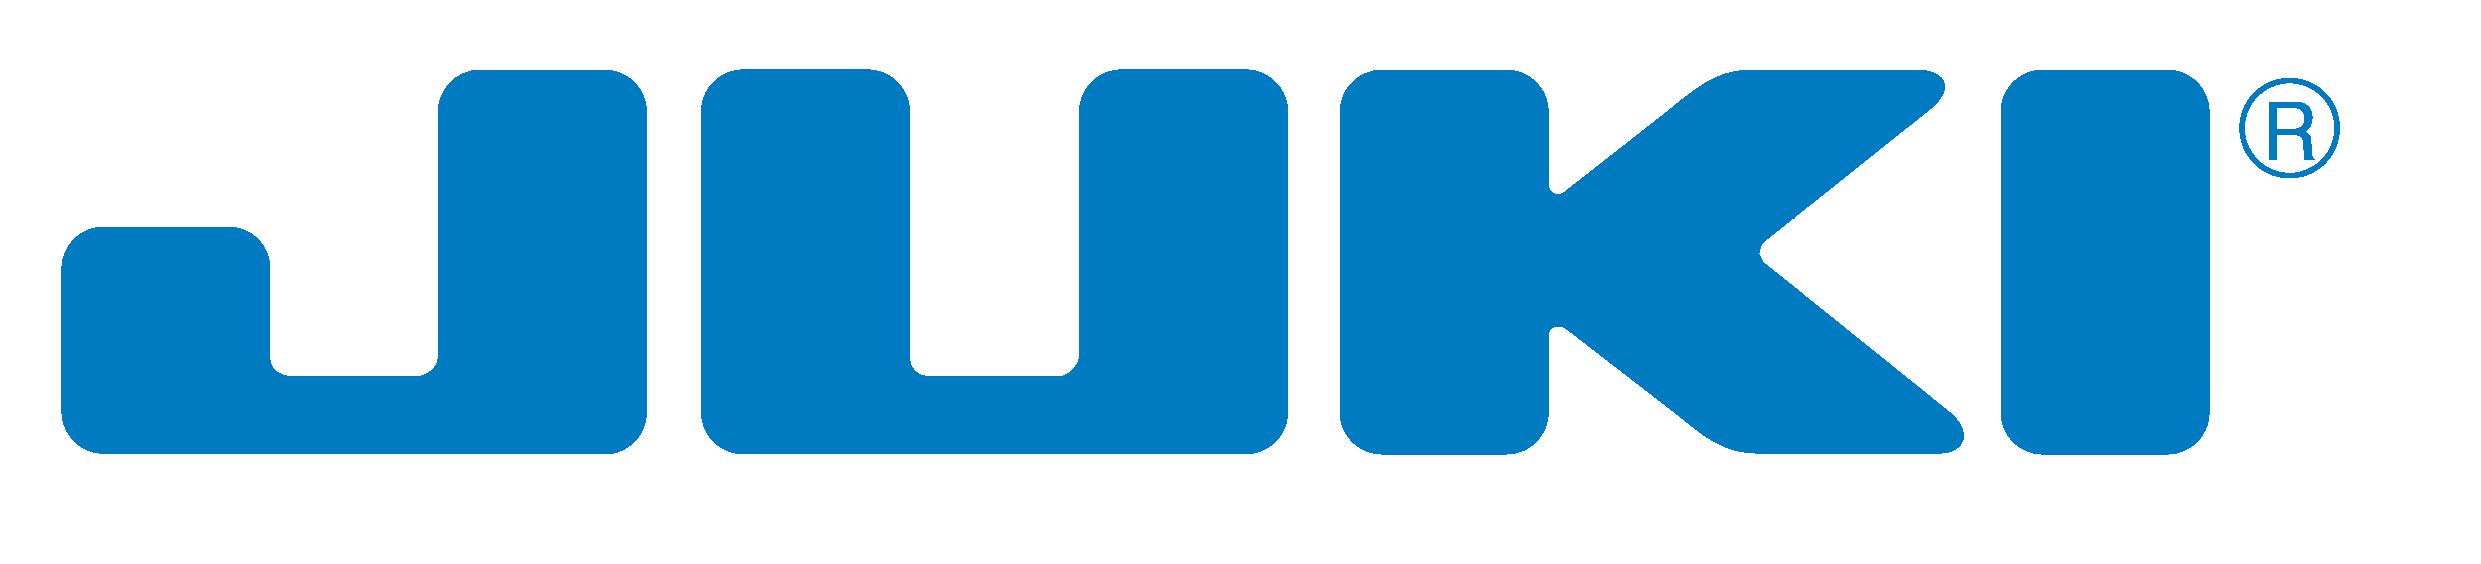 Juki Overlock MO-114